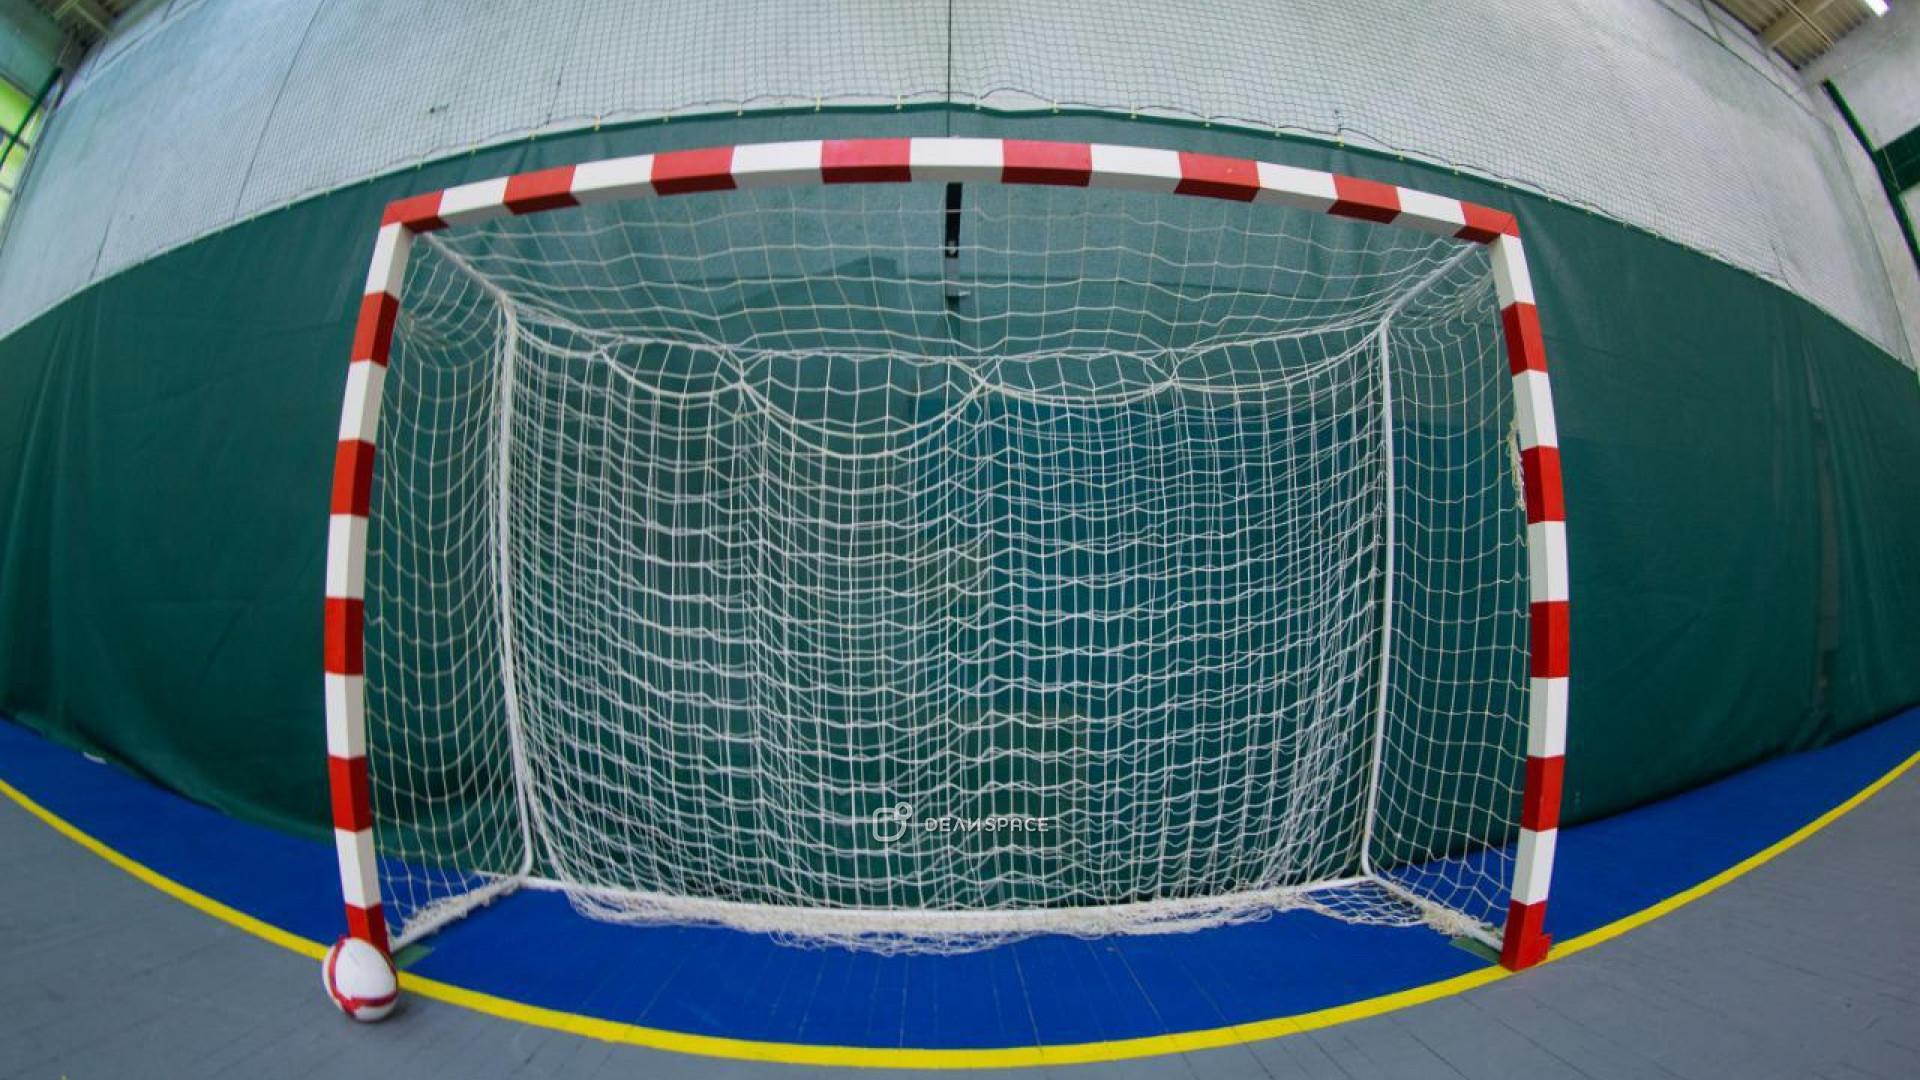 Зал для футбола и волейбола - фото №3